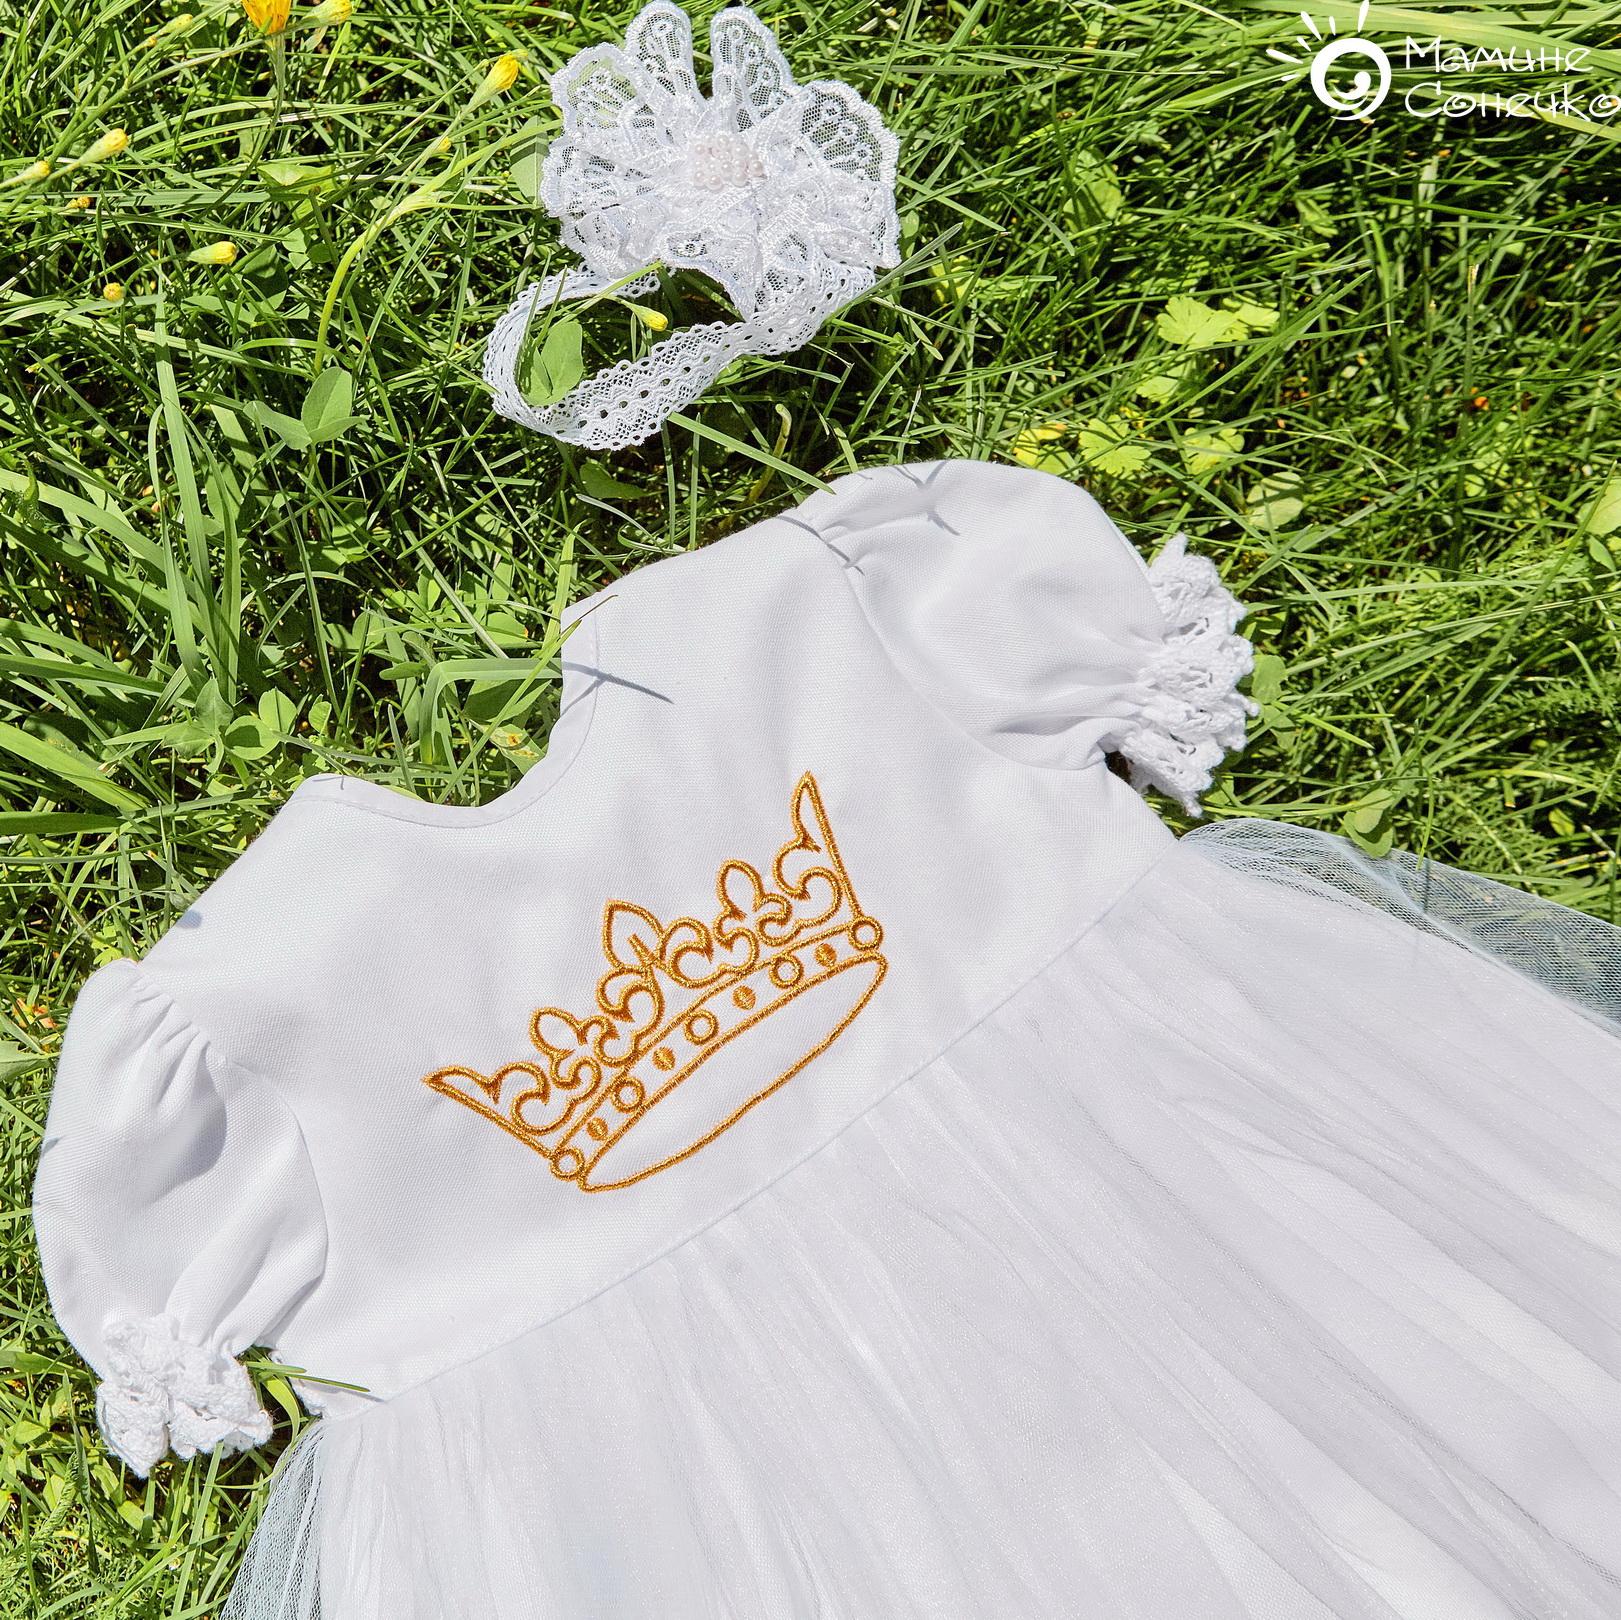 velyka-korona-zoloto-suknia-3